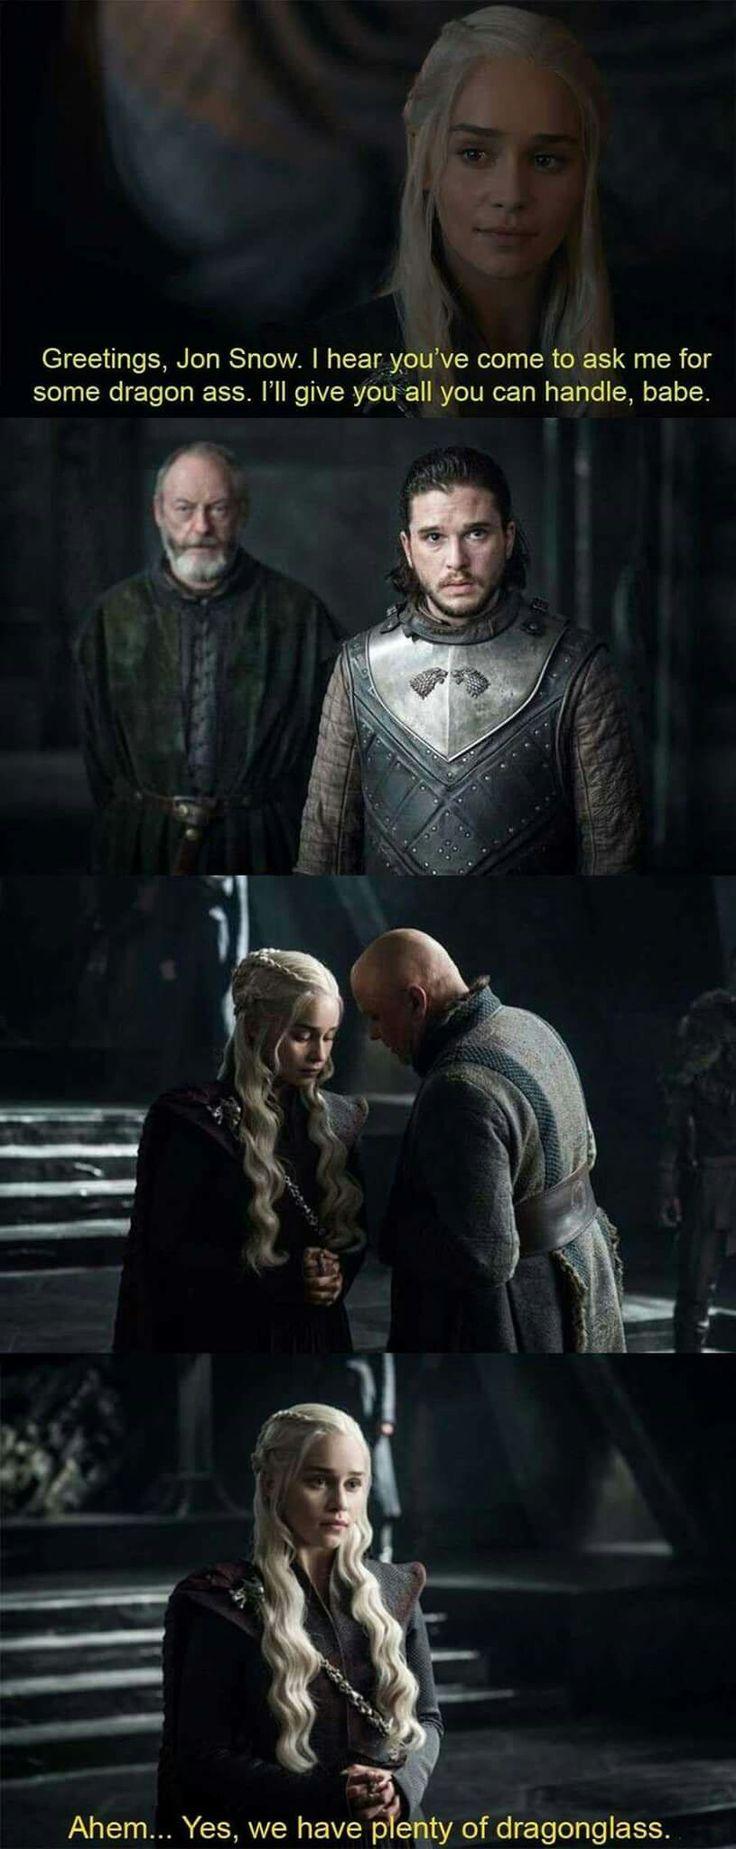 Game of thrones funny humour meme, season 7. Jon Snow, Daenerys Targaryen, Ser Davos Seaworth, Kit Harington, Emilia Clarke